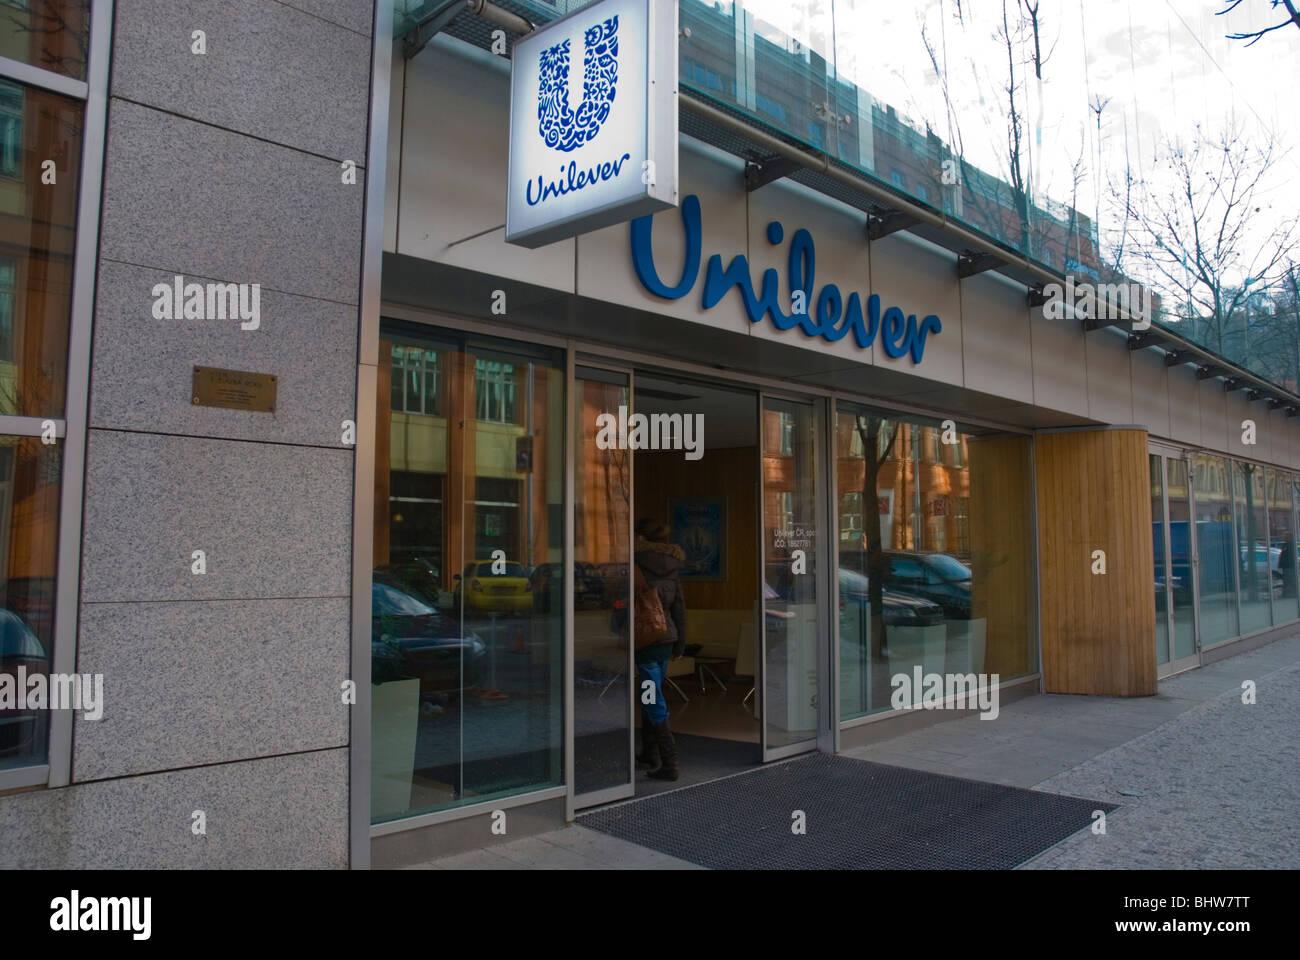 Unilever company branch exterior with sliding doors Karlin Prague Czech Republic Europe - Stock Image